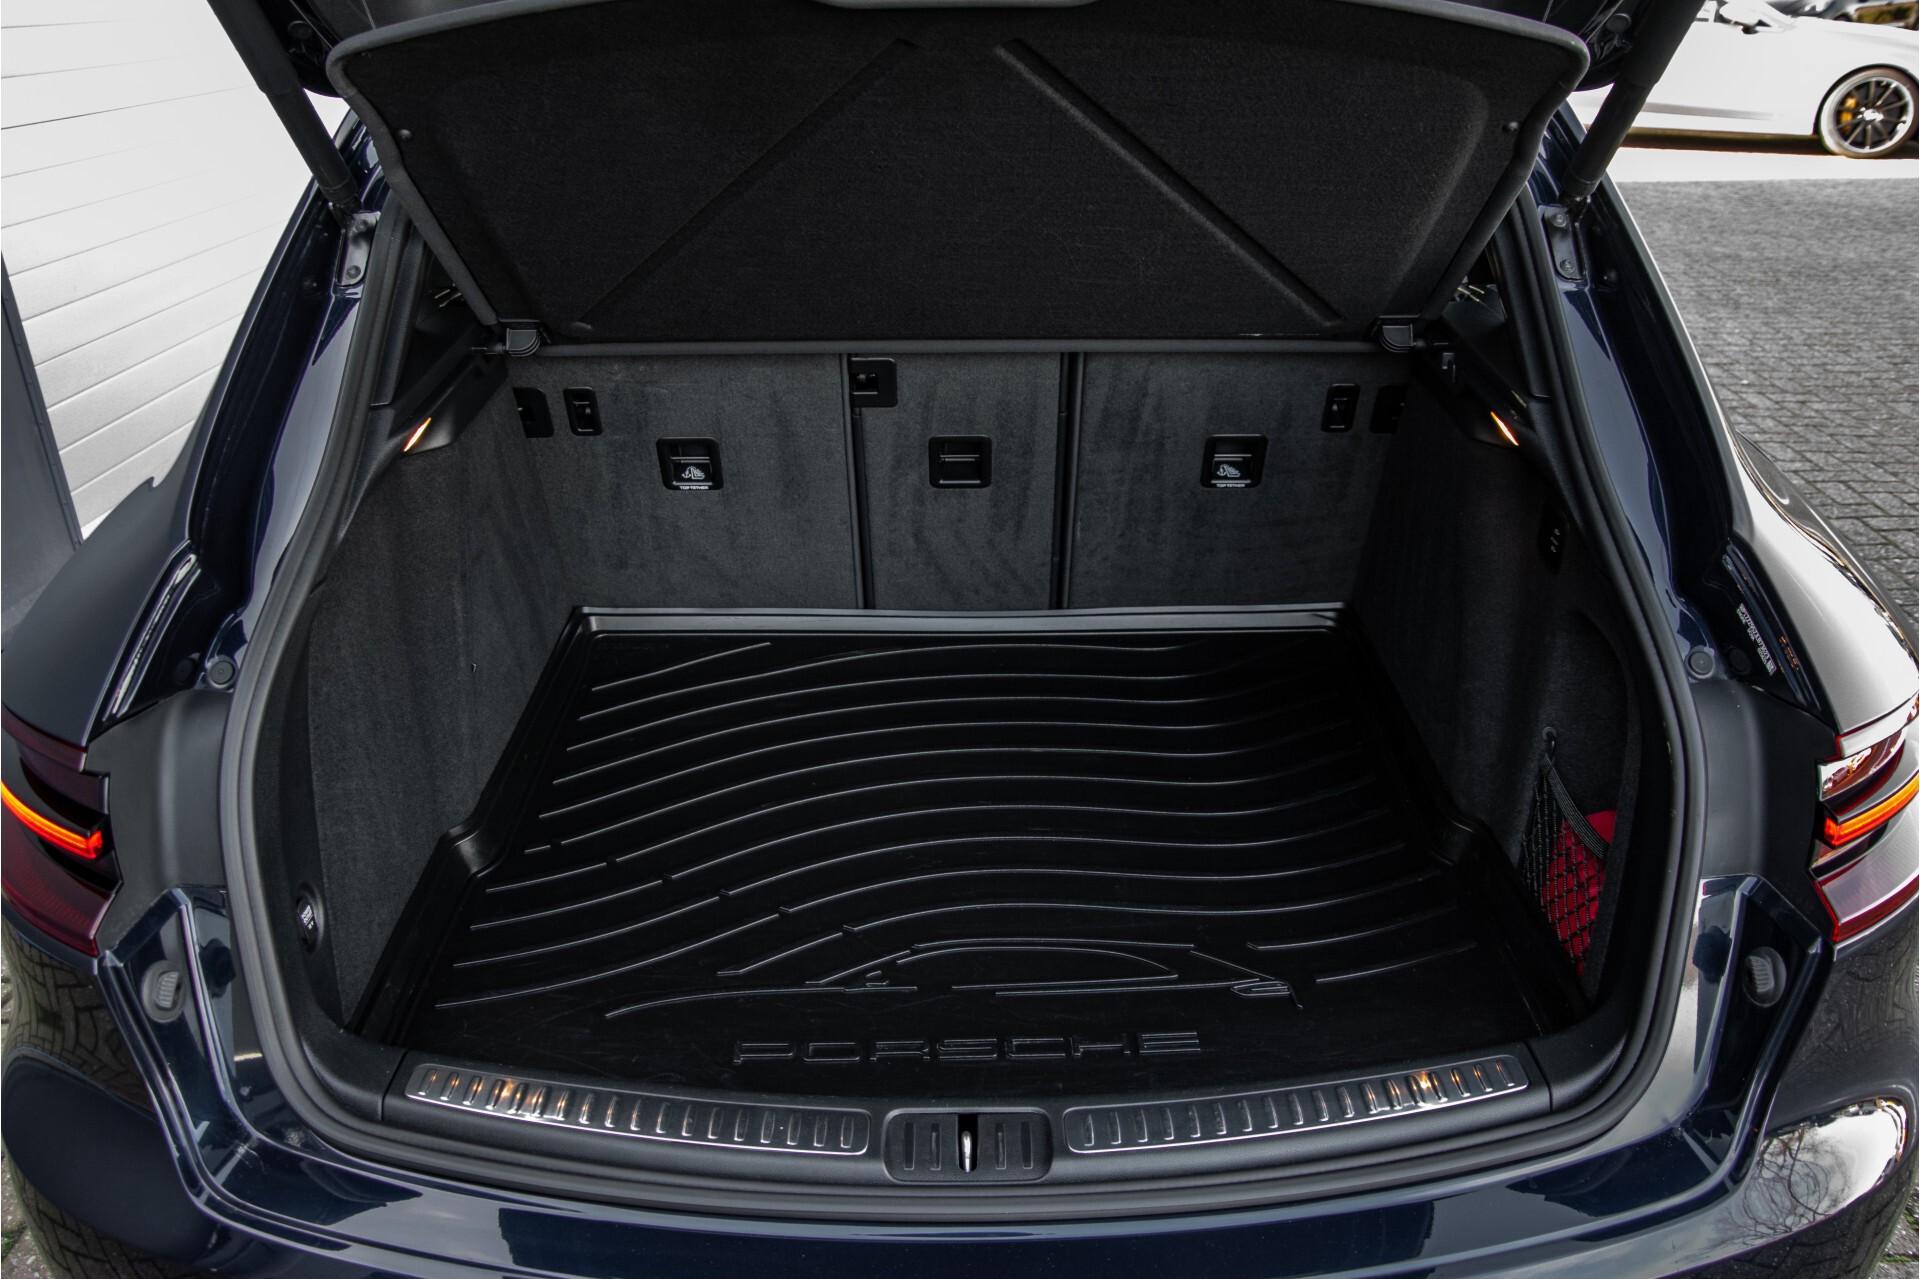 Porsche Macan 3.0 GTS Luchtvering/Panorama/Carbon/Bose/360-camera/Memory/PDLS Aut7 Foto 48